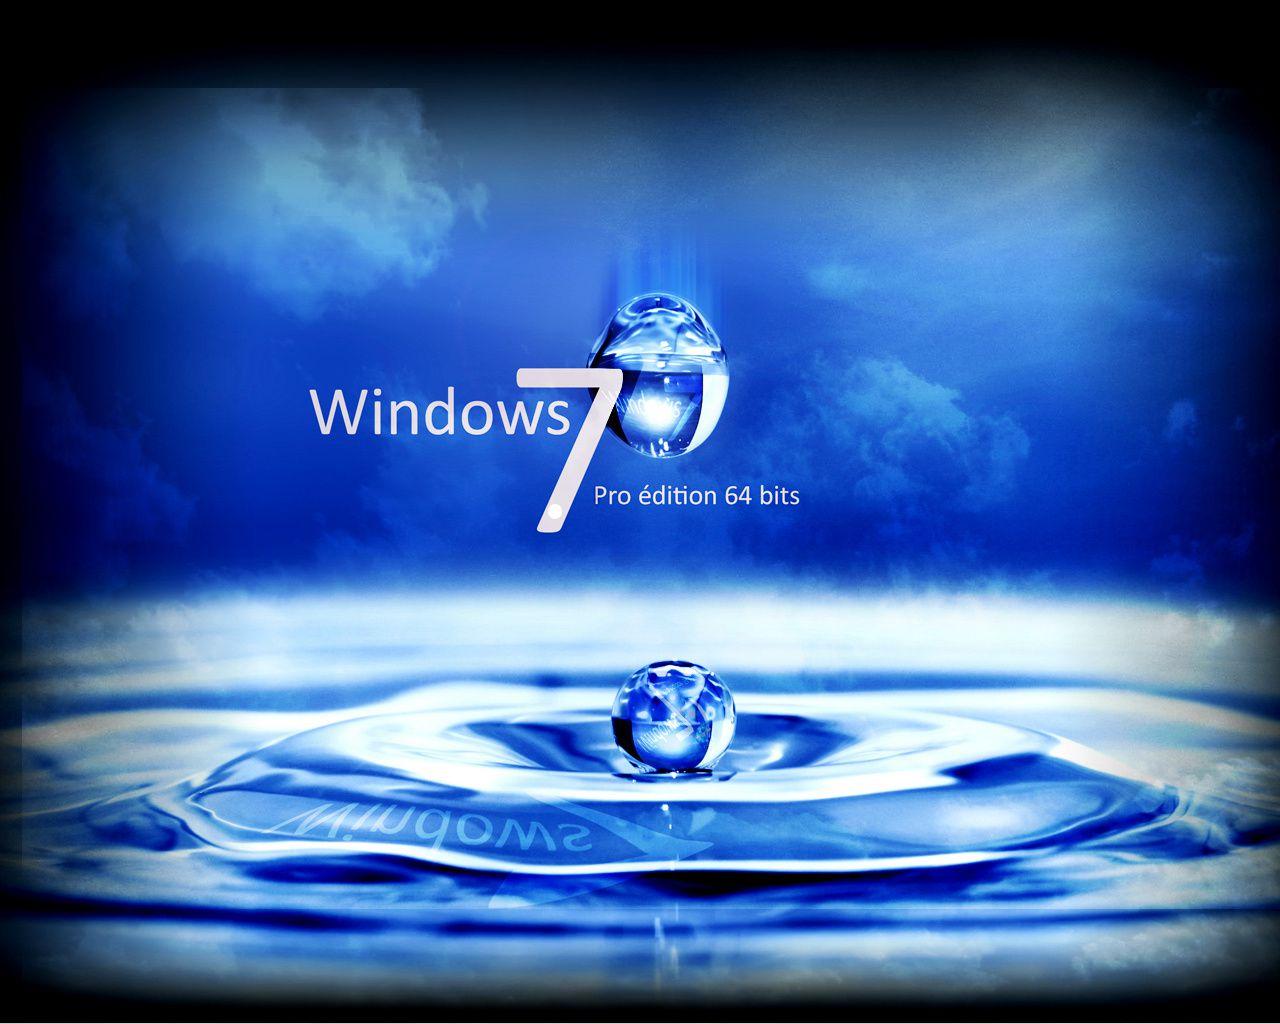 Fond Ecran Windows 7 Graphic Musico Blog Par Blogtrotter